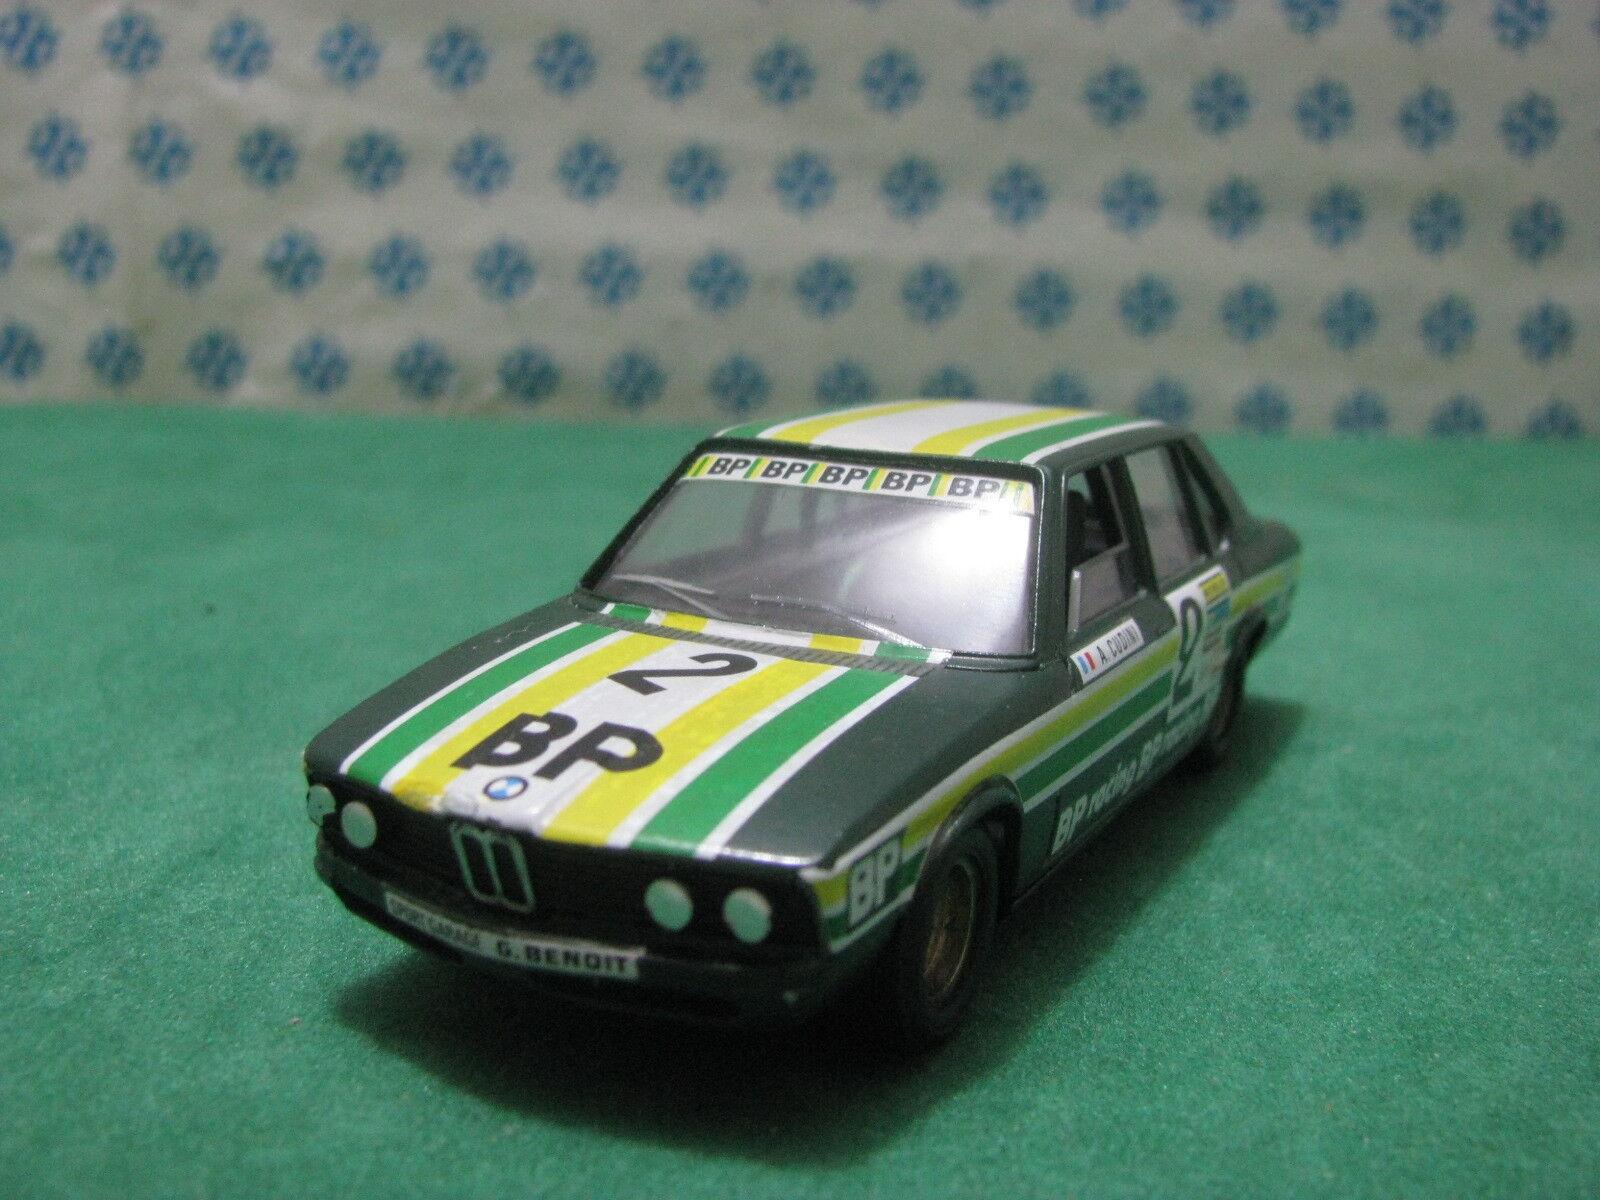 Vintage - BMW 530 berlina 3000cc. ROUEN 1978 - 1 43 Transkit Solido